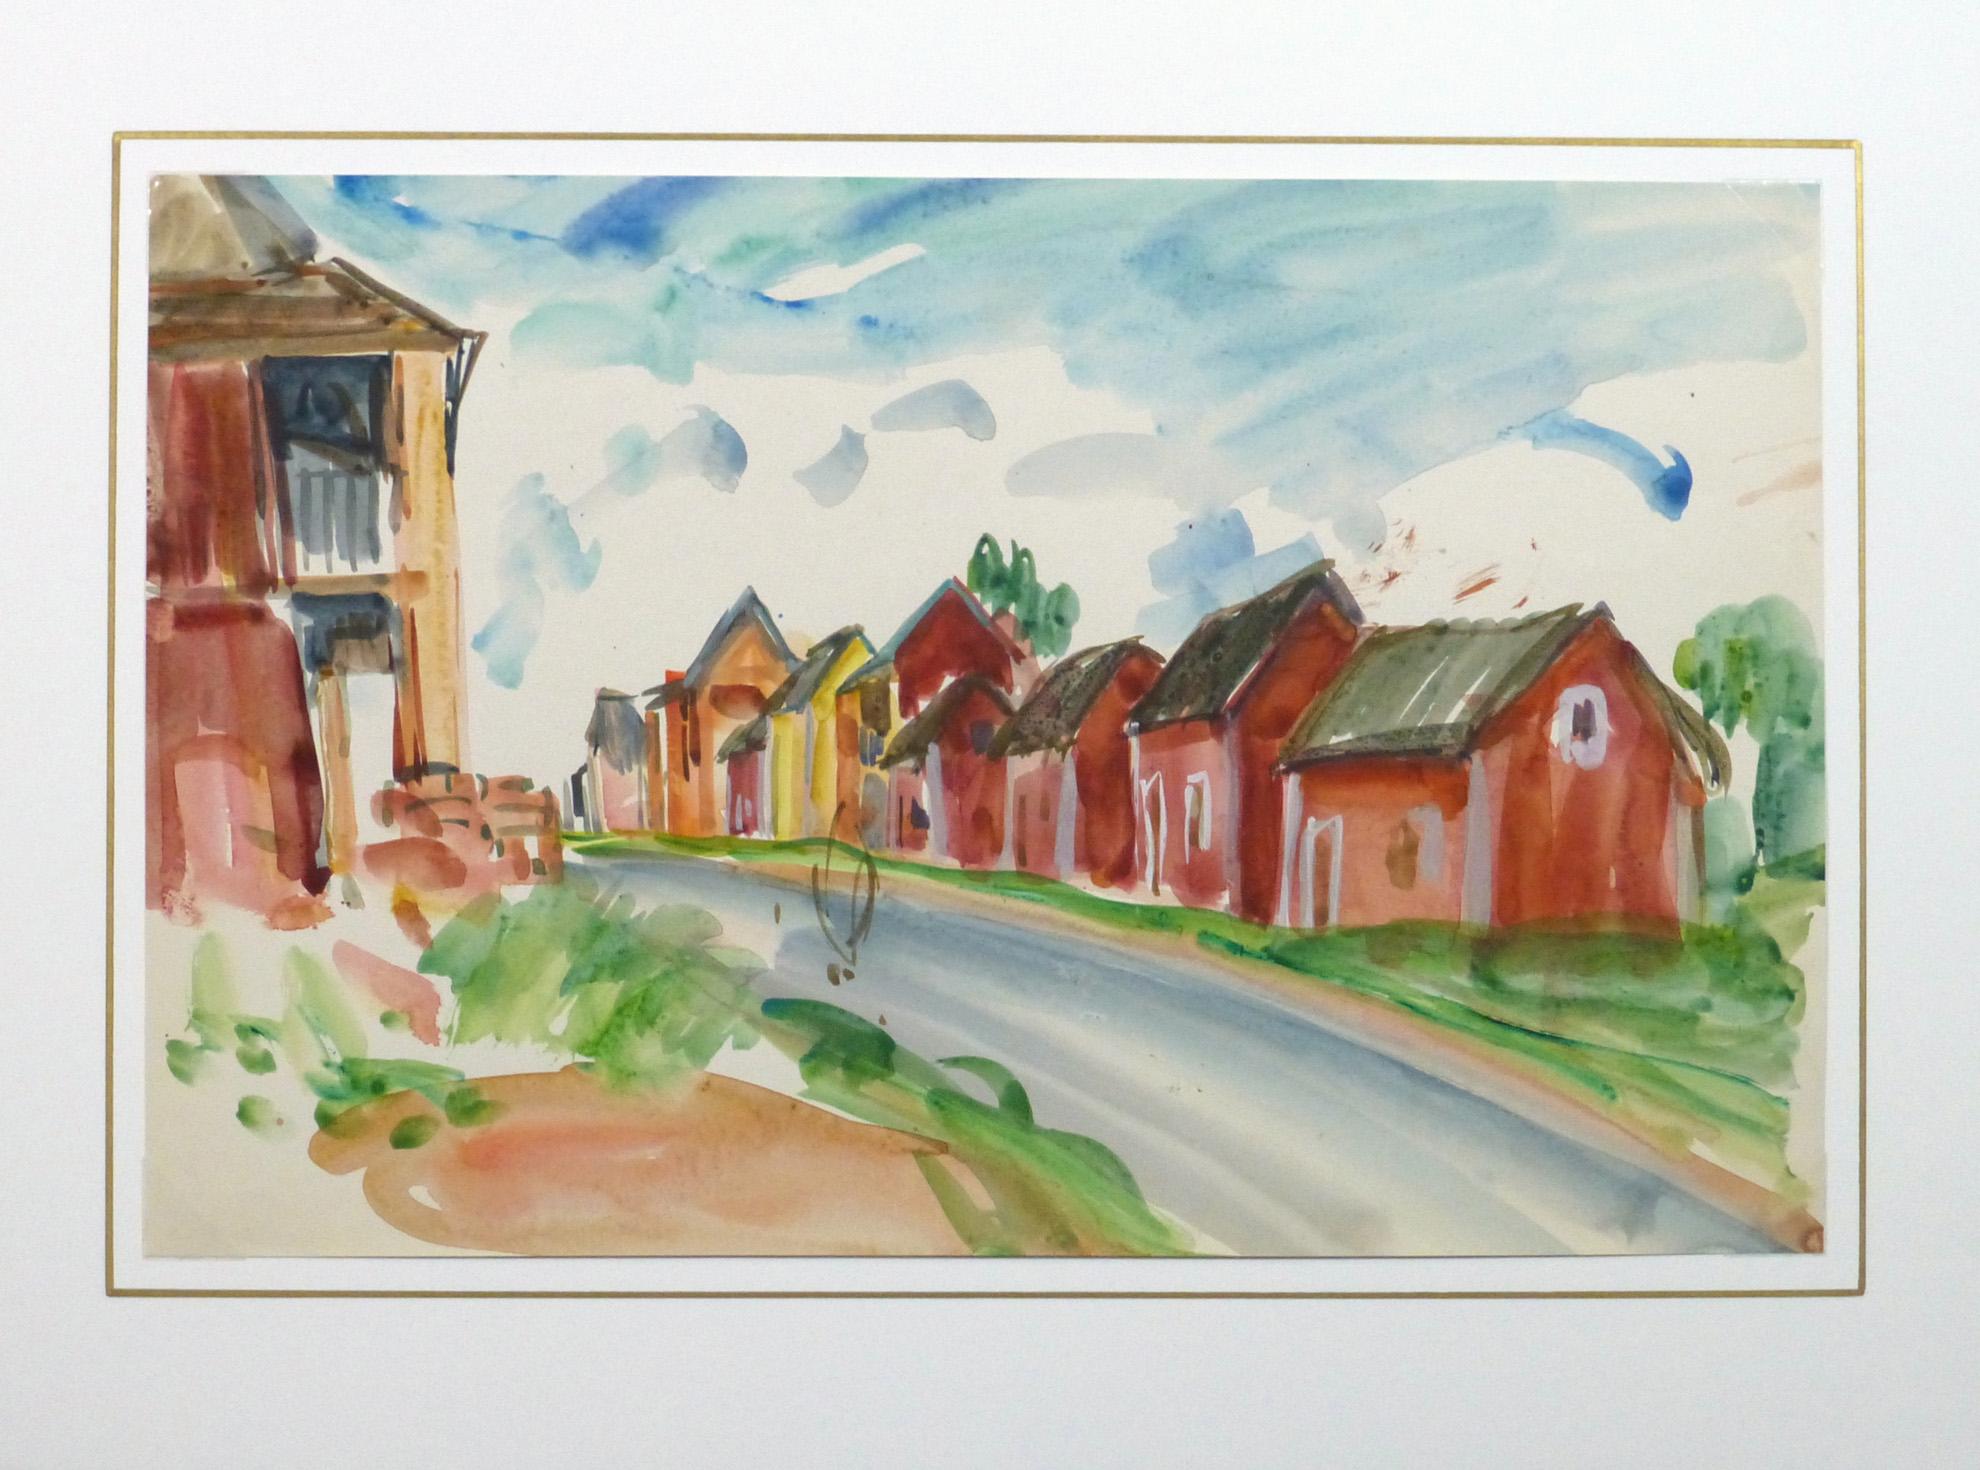 Watercolor Landscape - Island Village - Matted -9970M